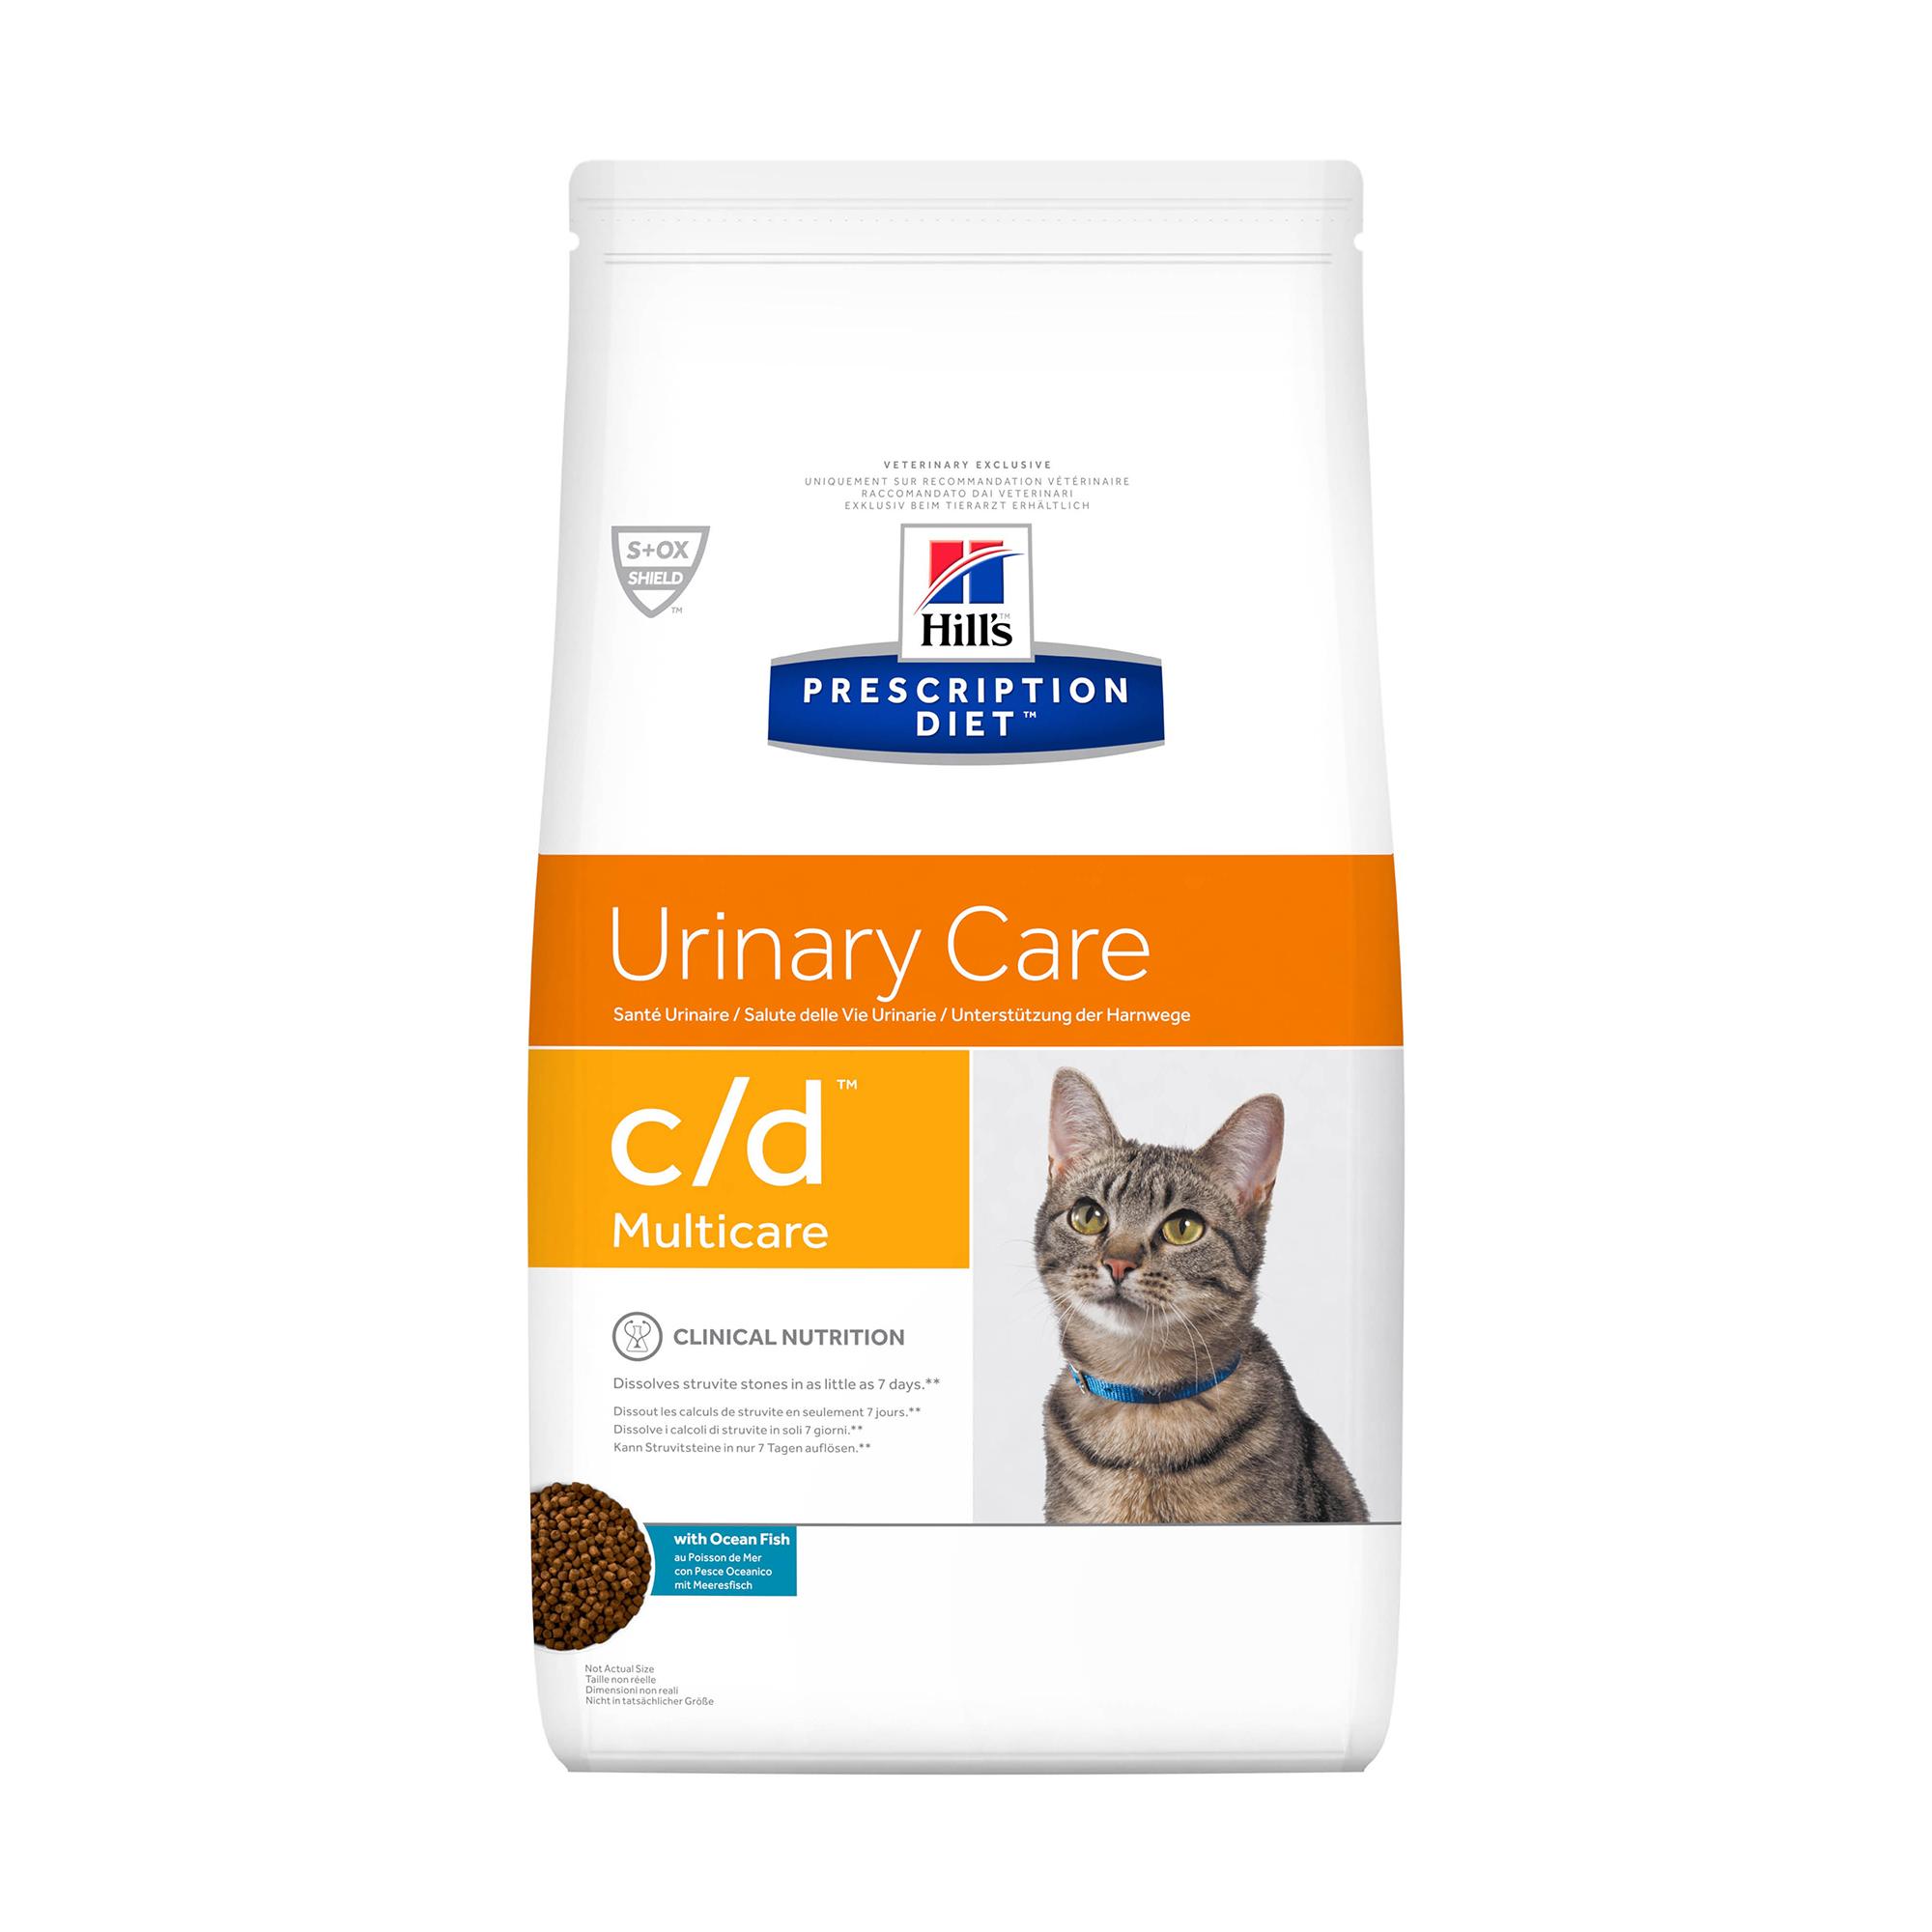 Сухой корм для кошек Hill's P/D C/D Multicare Urinary Care с рыбой, 1.5кг